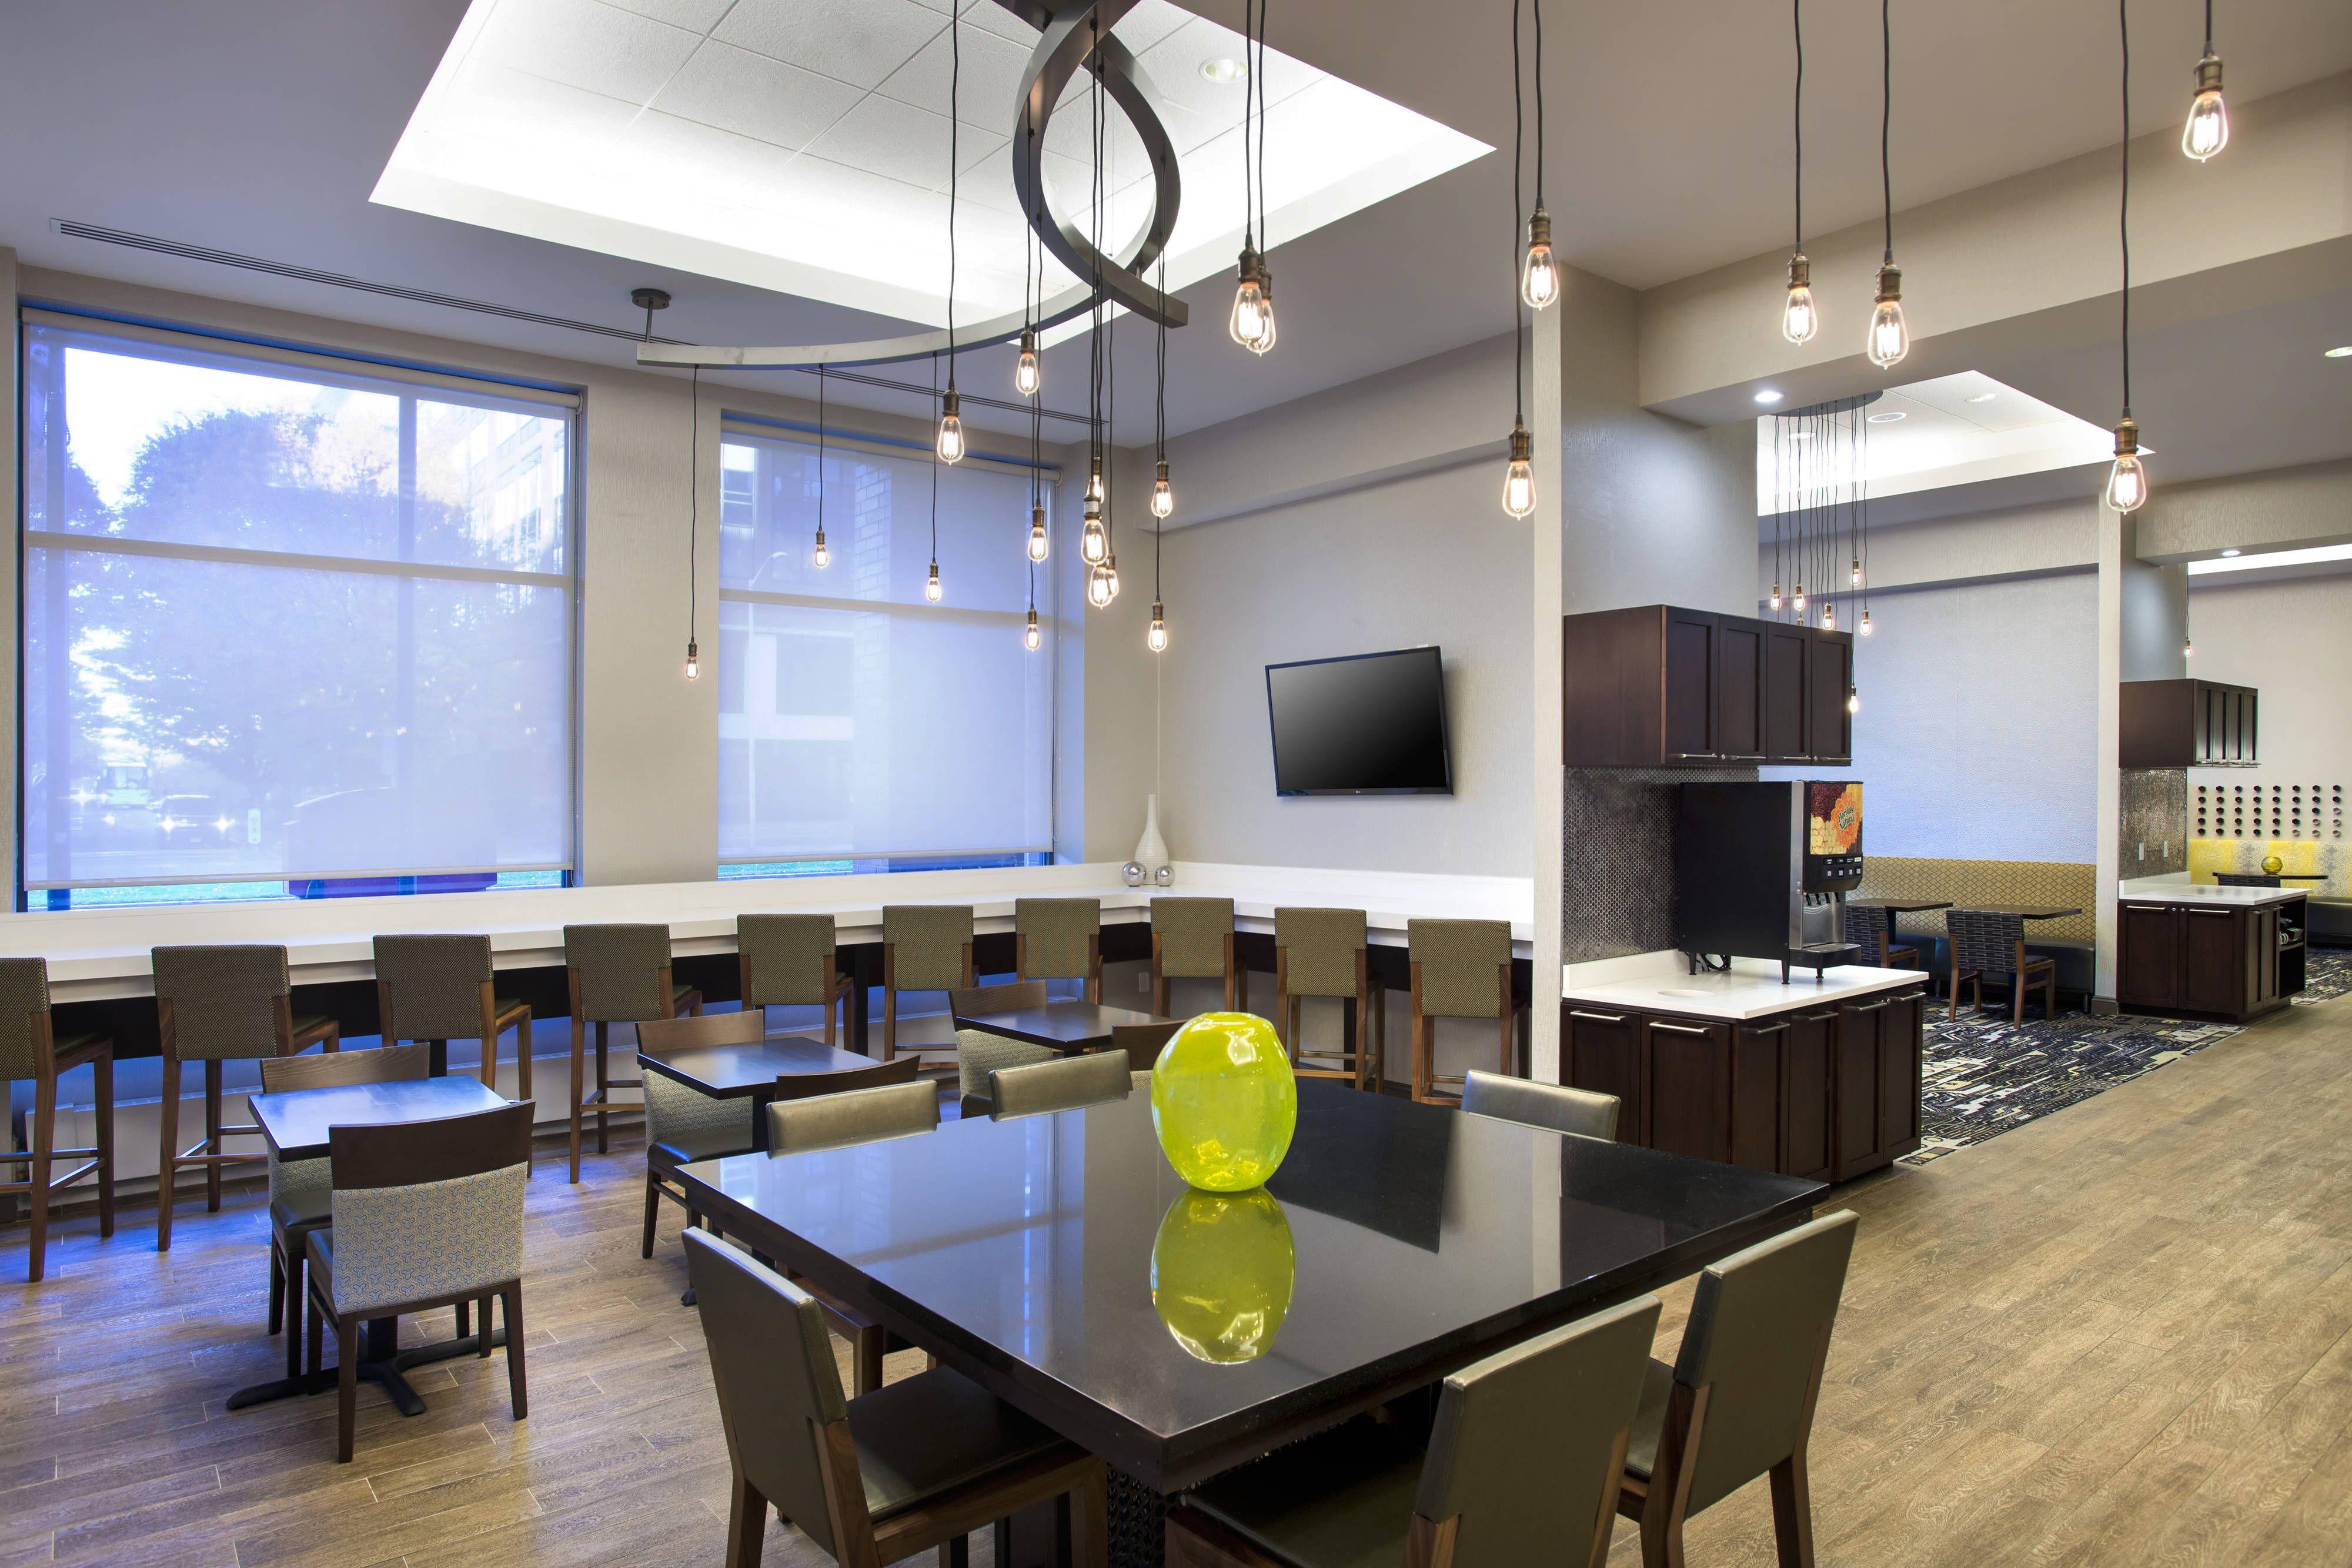 Residence Inn Boston Cambridge Dining Area Suite,